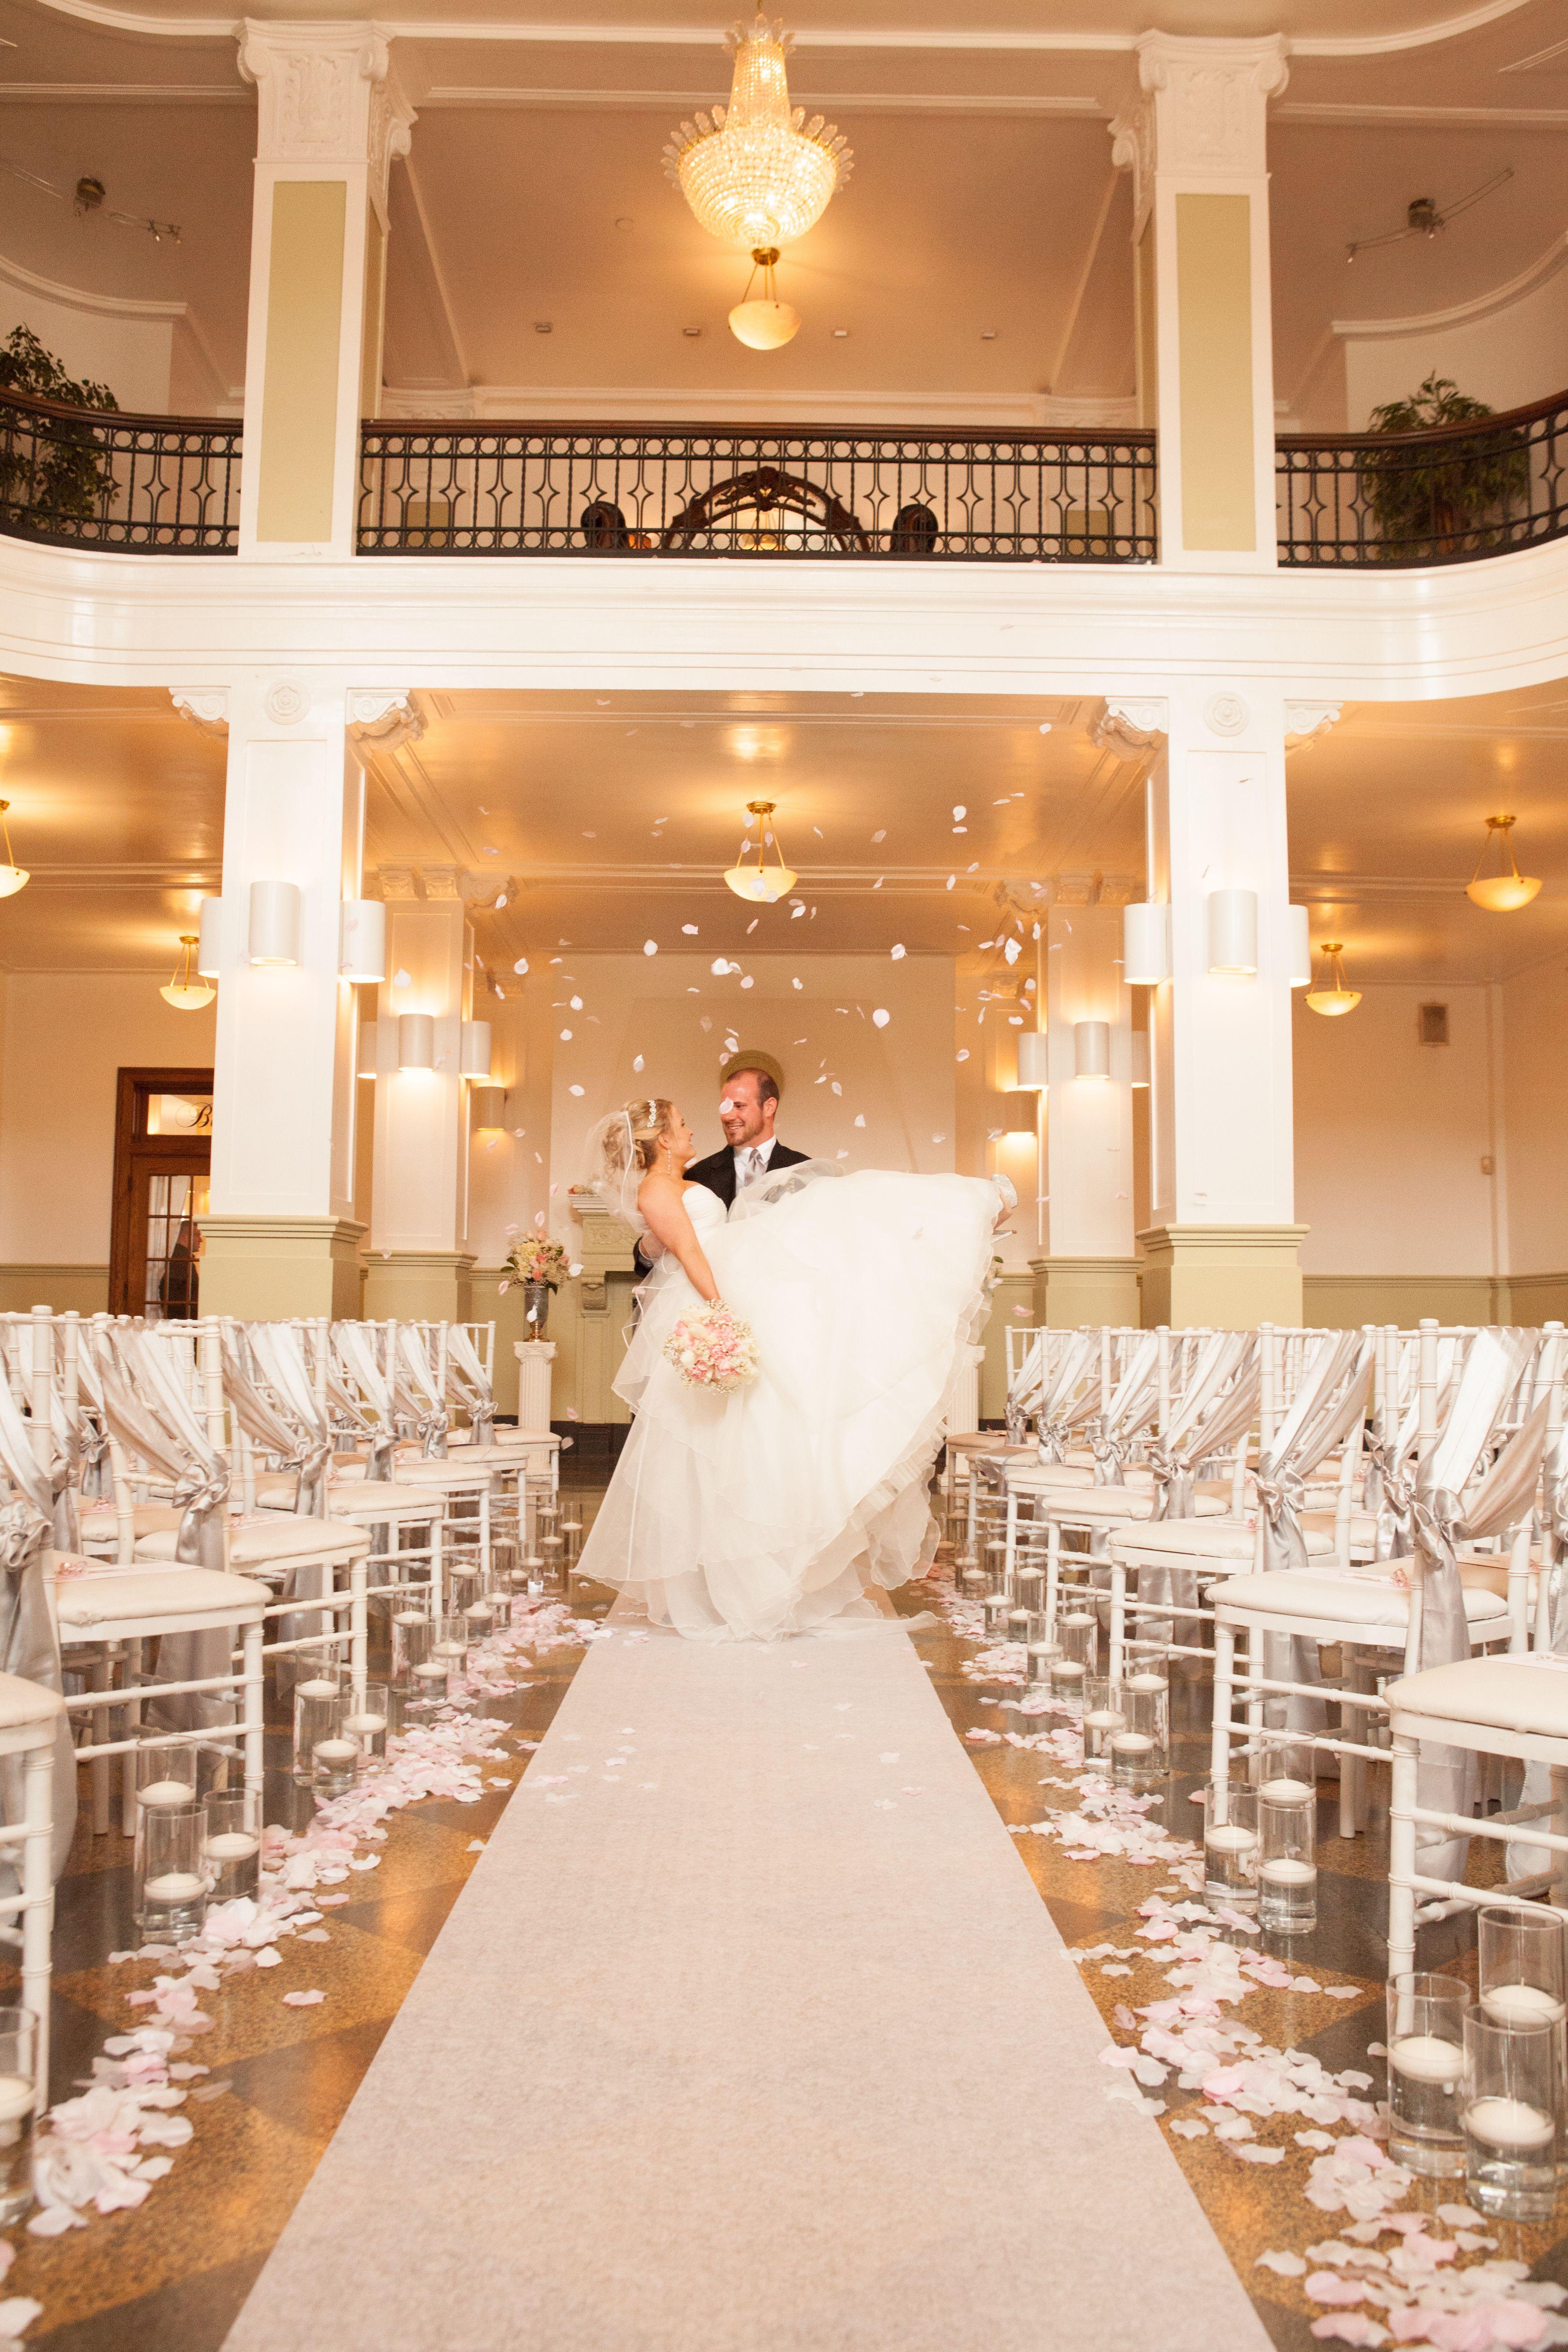 An Elegant Classic Wedding At Monte Cristo Ballroom In Everett